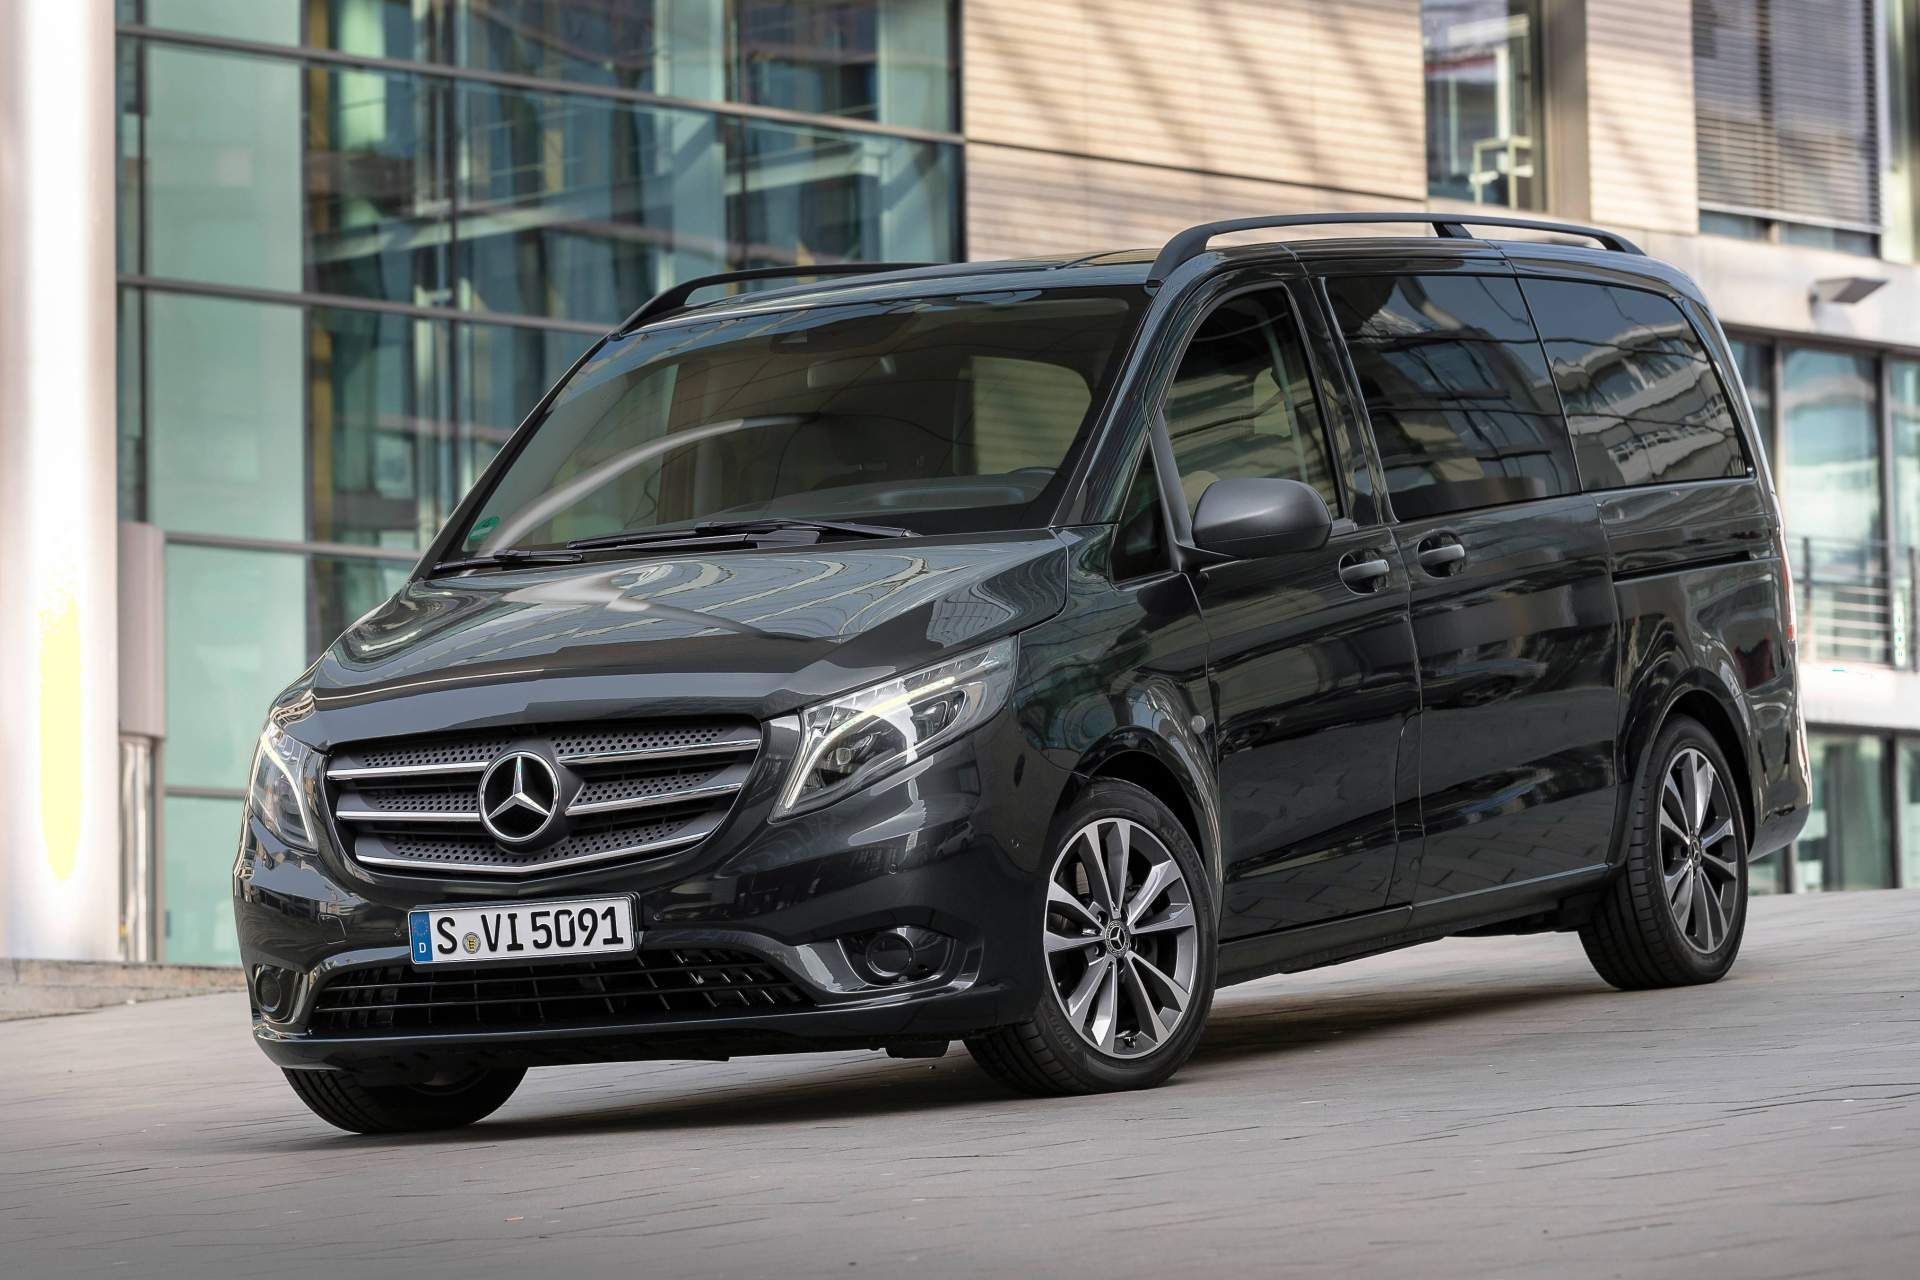 17 Mercedes Benz Viano Ideas Mercedes Benz Viano Viano Mercedes Benz